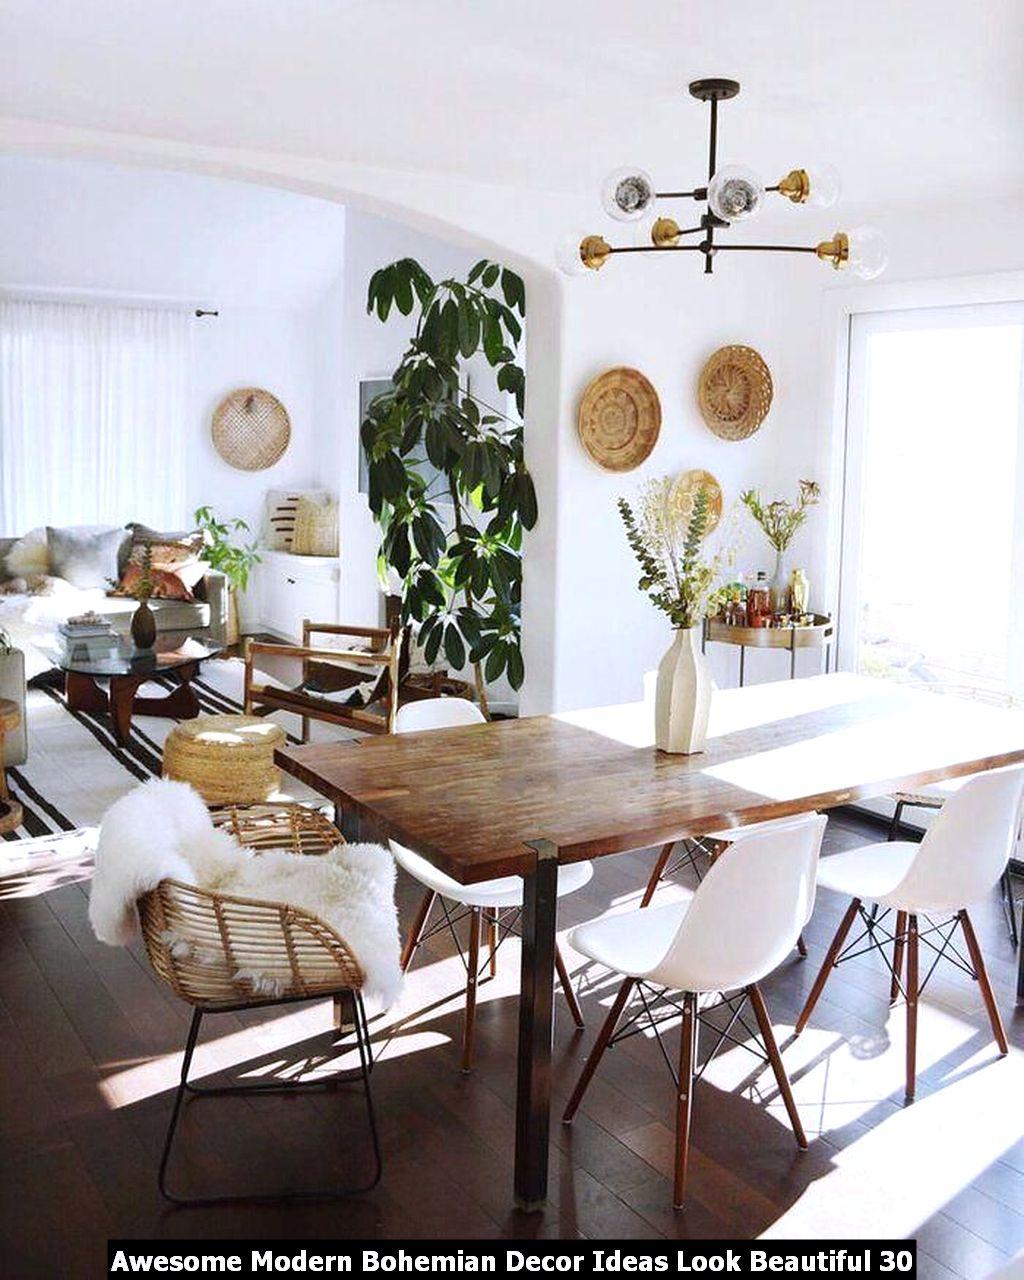 Awesome Modern Bohemian Decor Ideas Look Beautiful 30